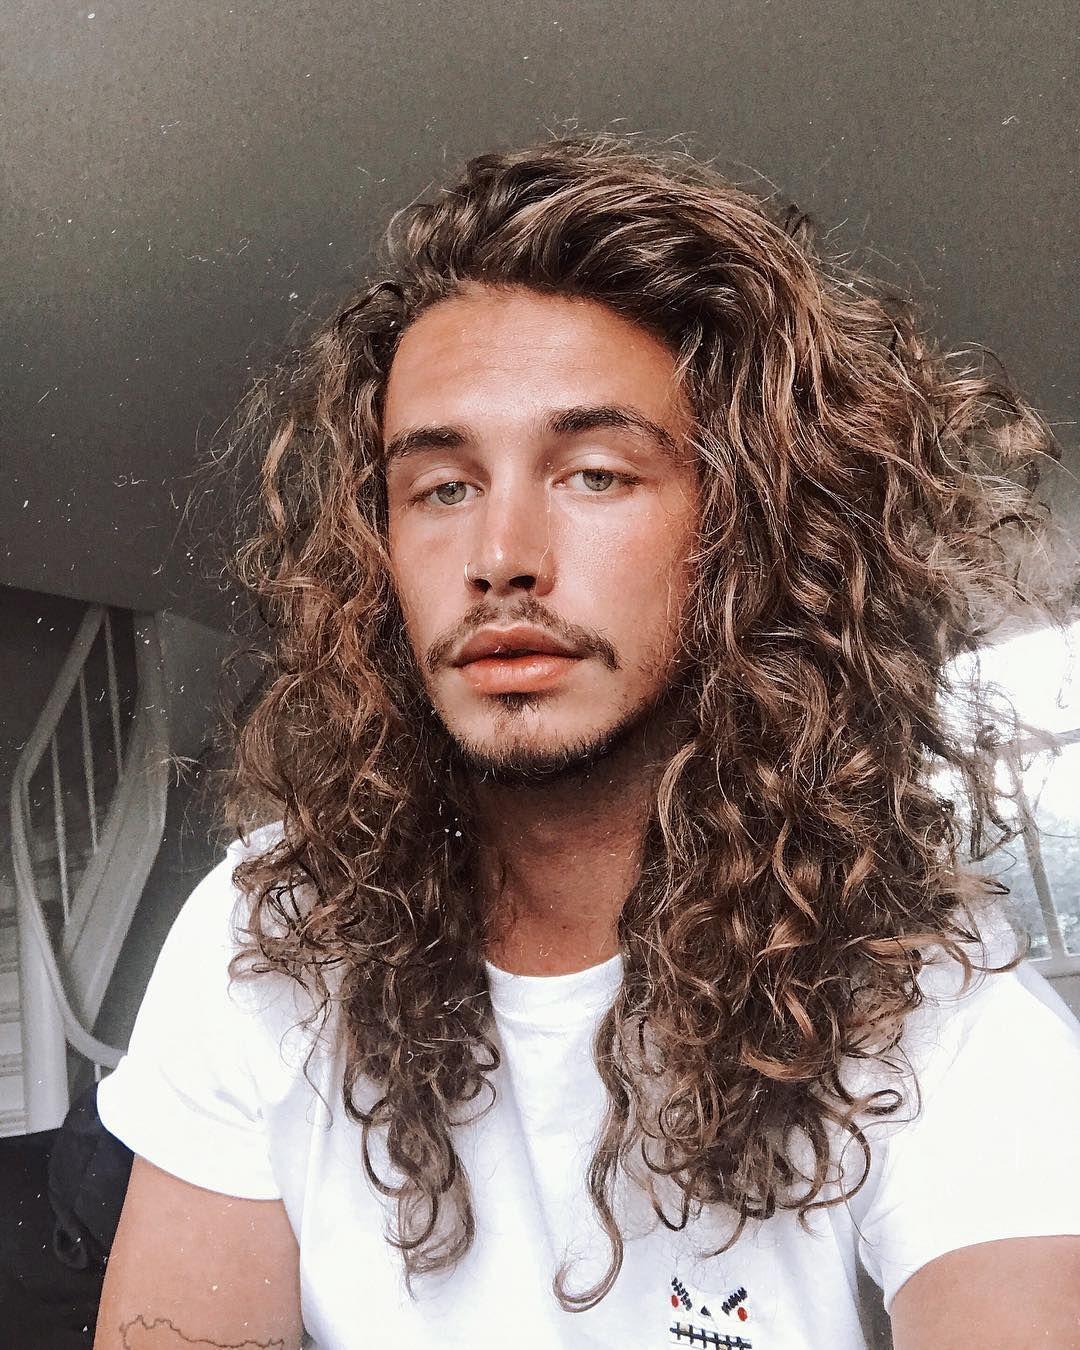 Pin on Guys hair styles